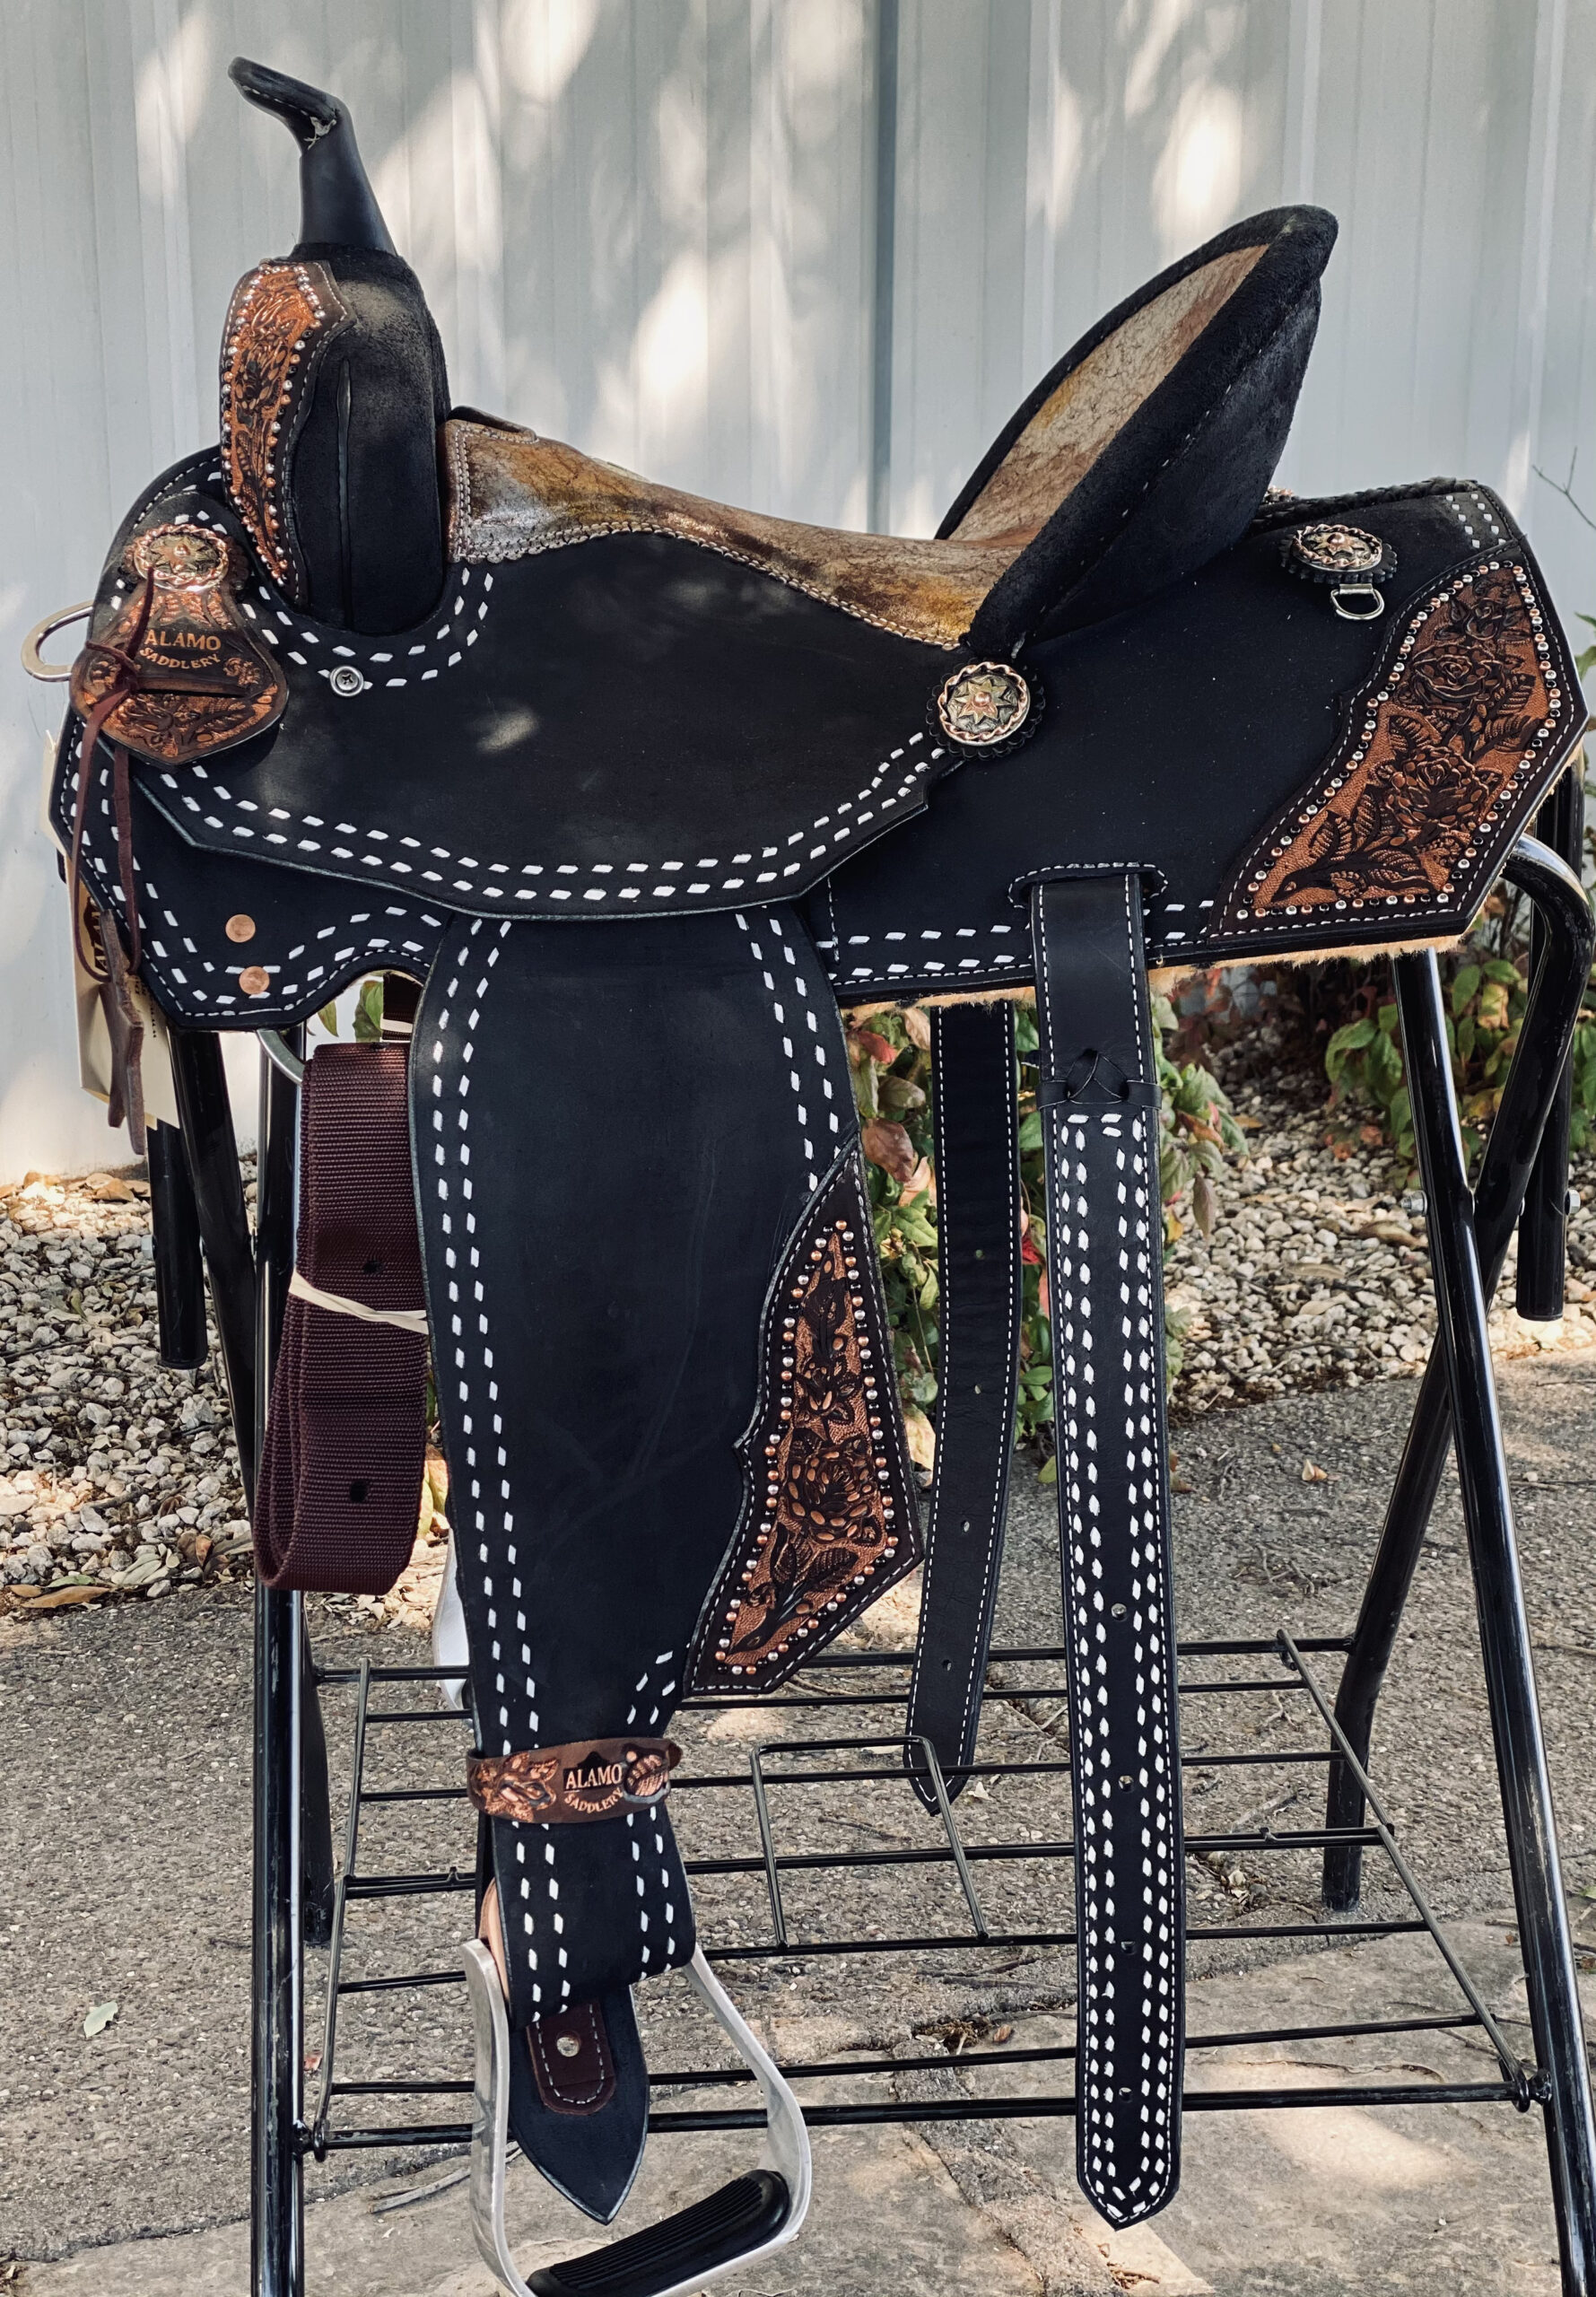 <b>15in</b><p>Black Beauty barrel saddle </B></p>